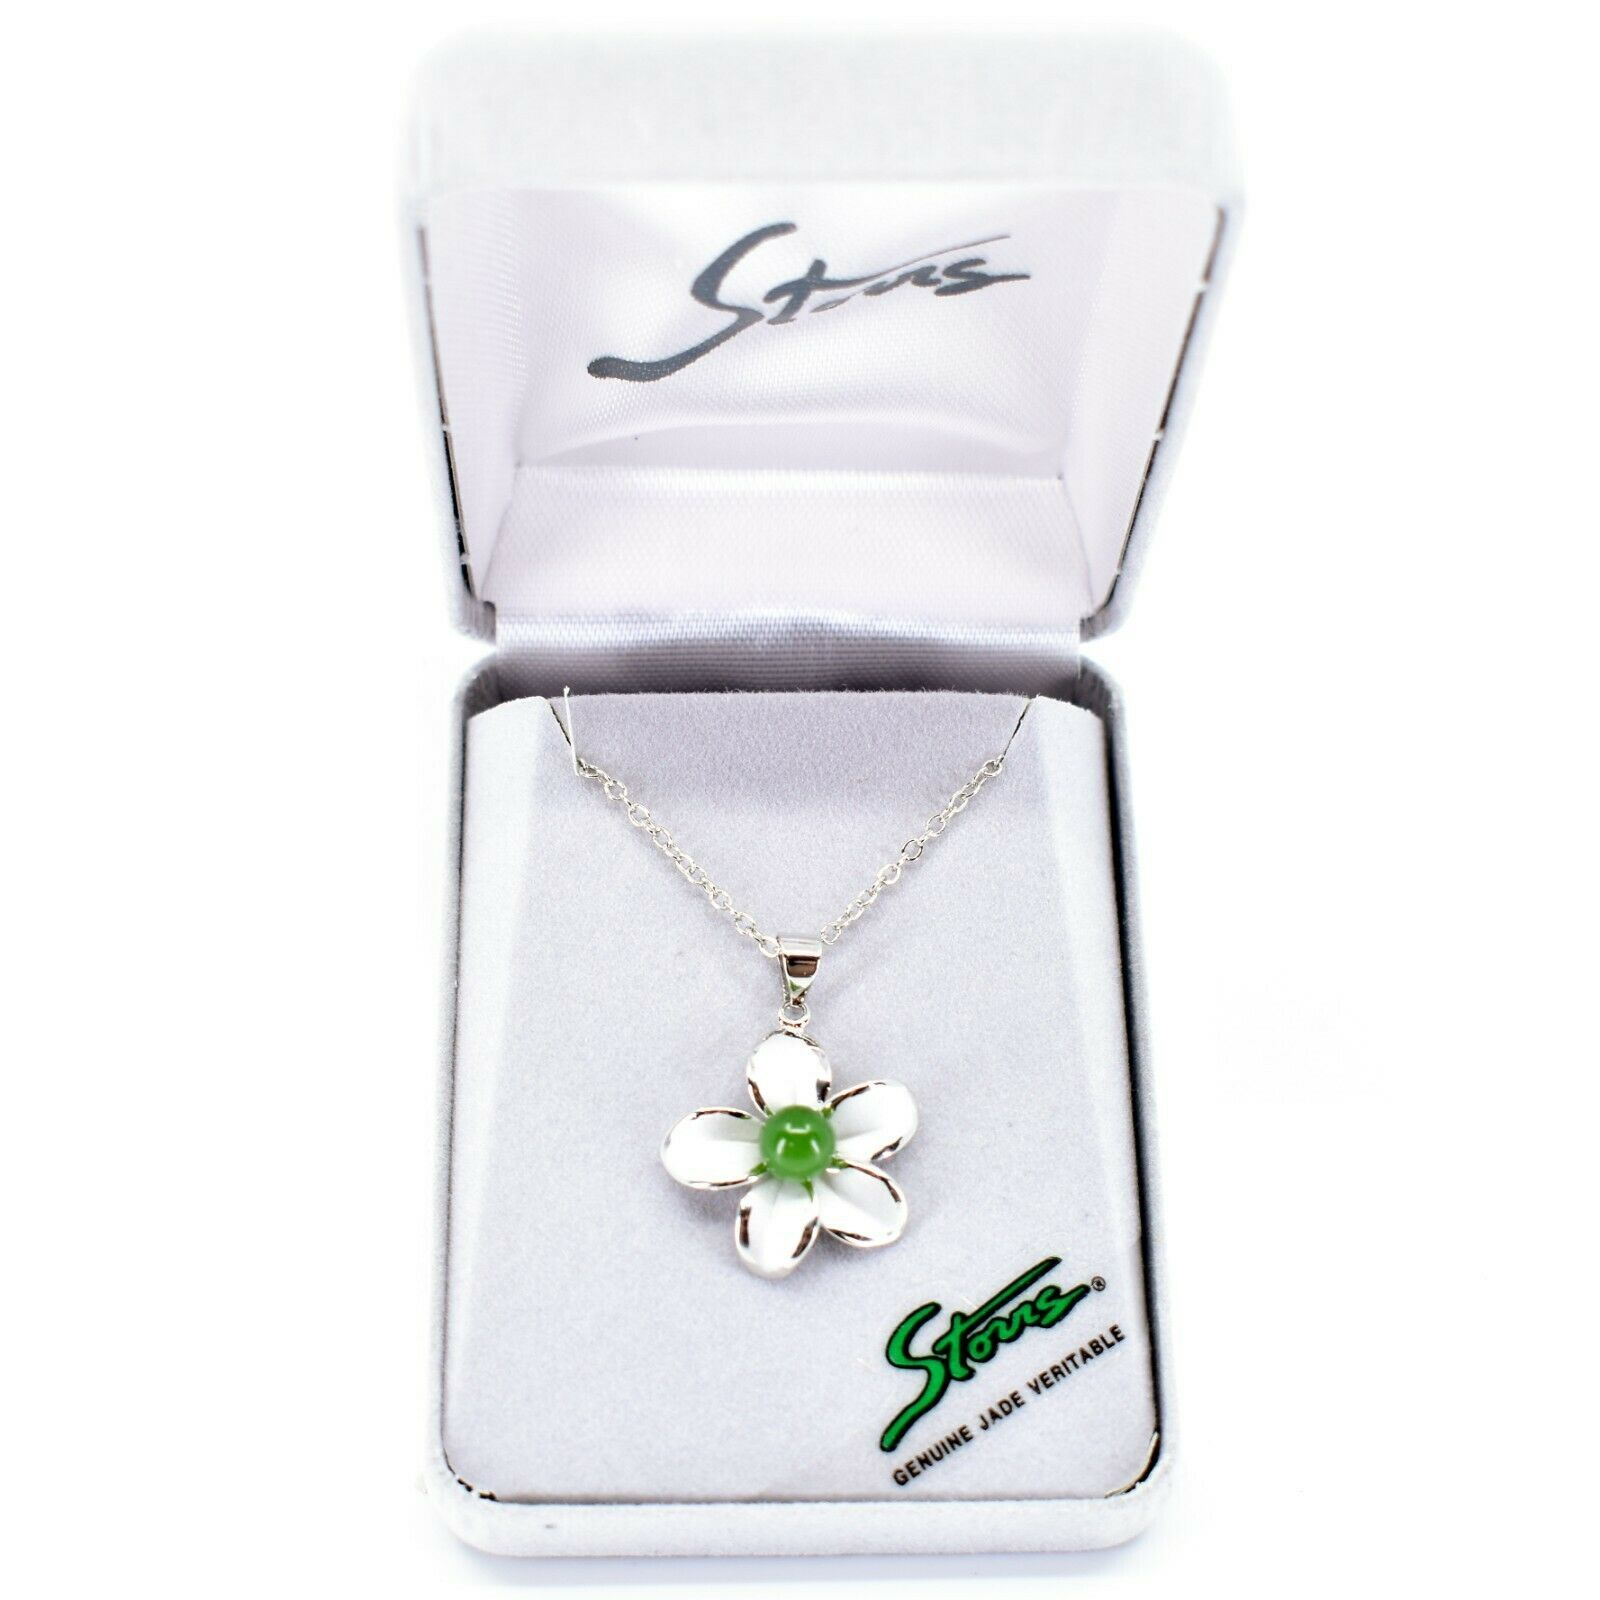 Storrs Genuine Jade Veritable Forget Me Not Flower Pendant Silver Tone Necklace